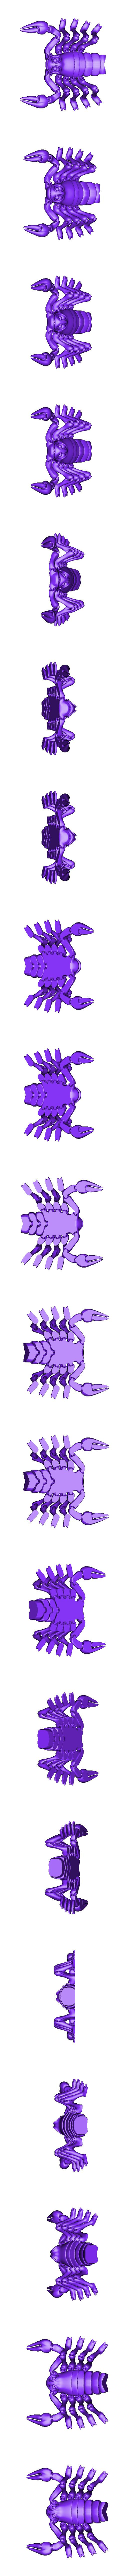 Flexi_Scorpion_Big_Body.STL Download STL file Flexi Print-In-Place Scorpion • 3D printer object, FlexiFactory